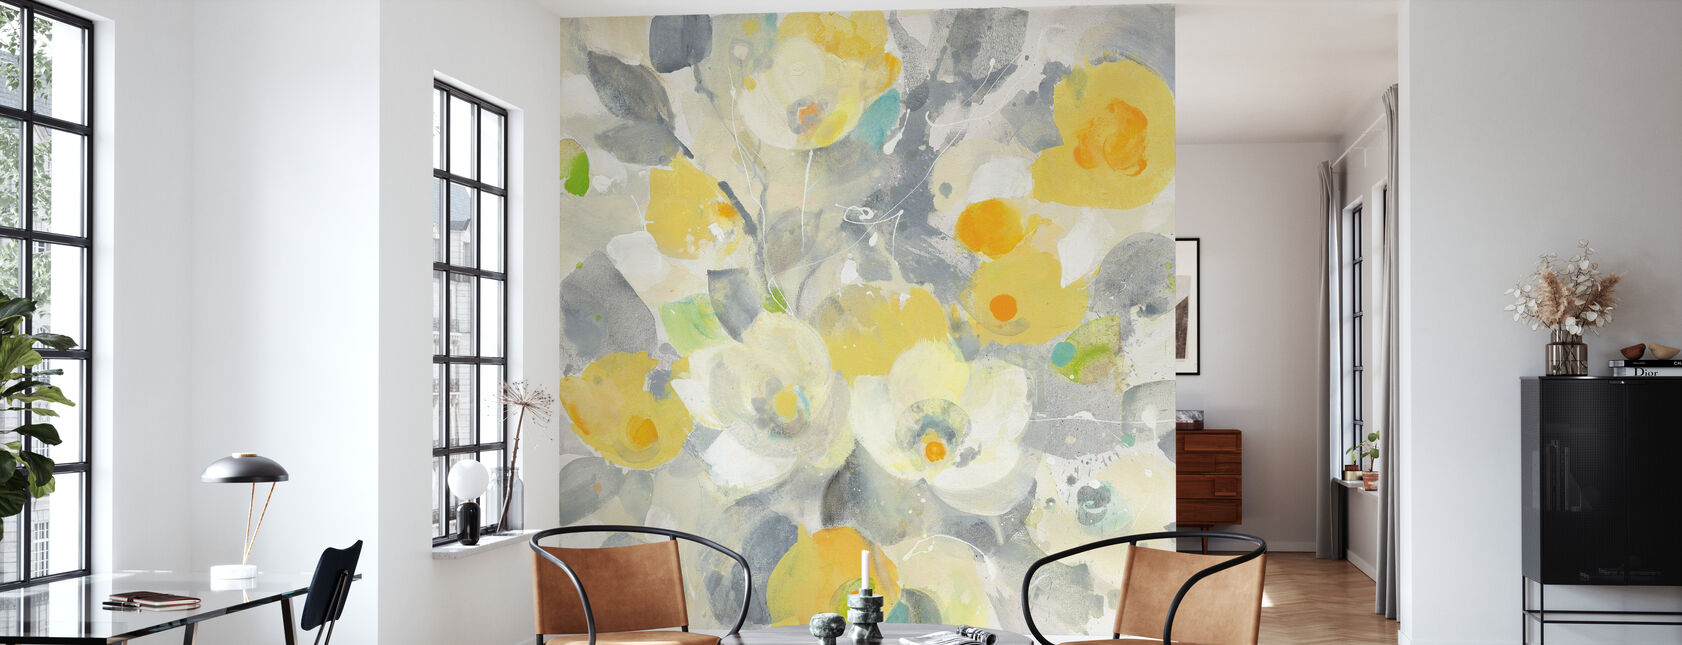 Buttercups - Wallpaper - Living Room